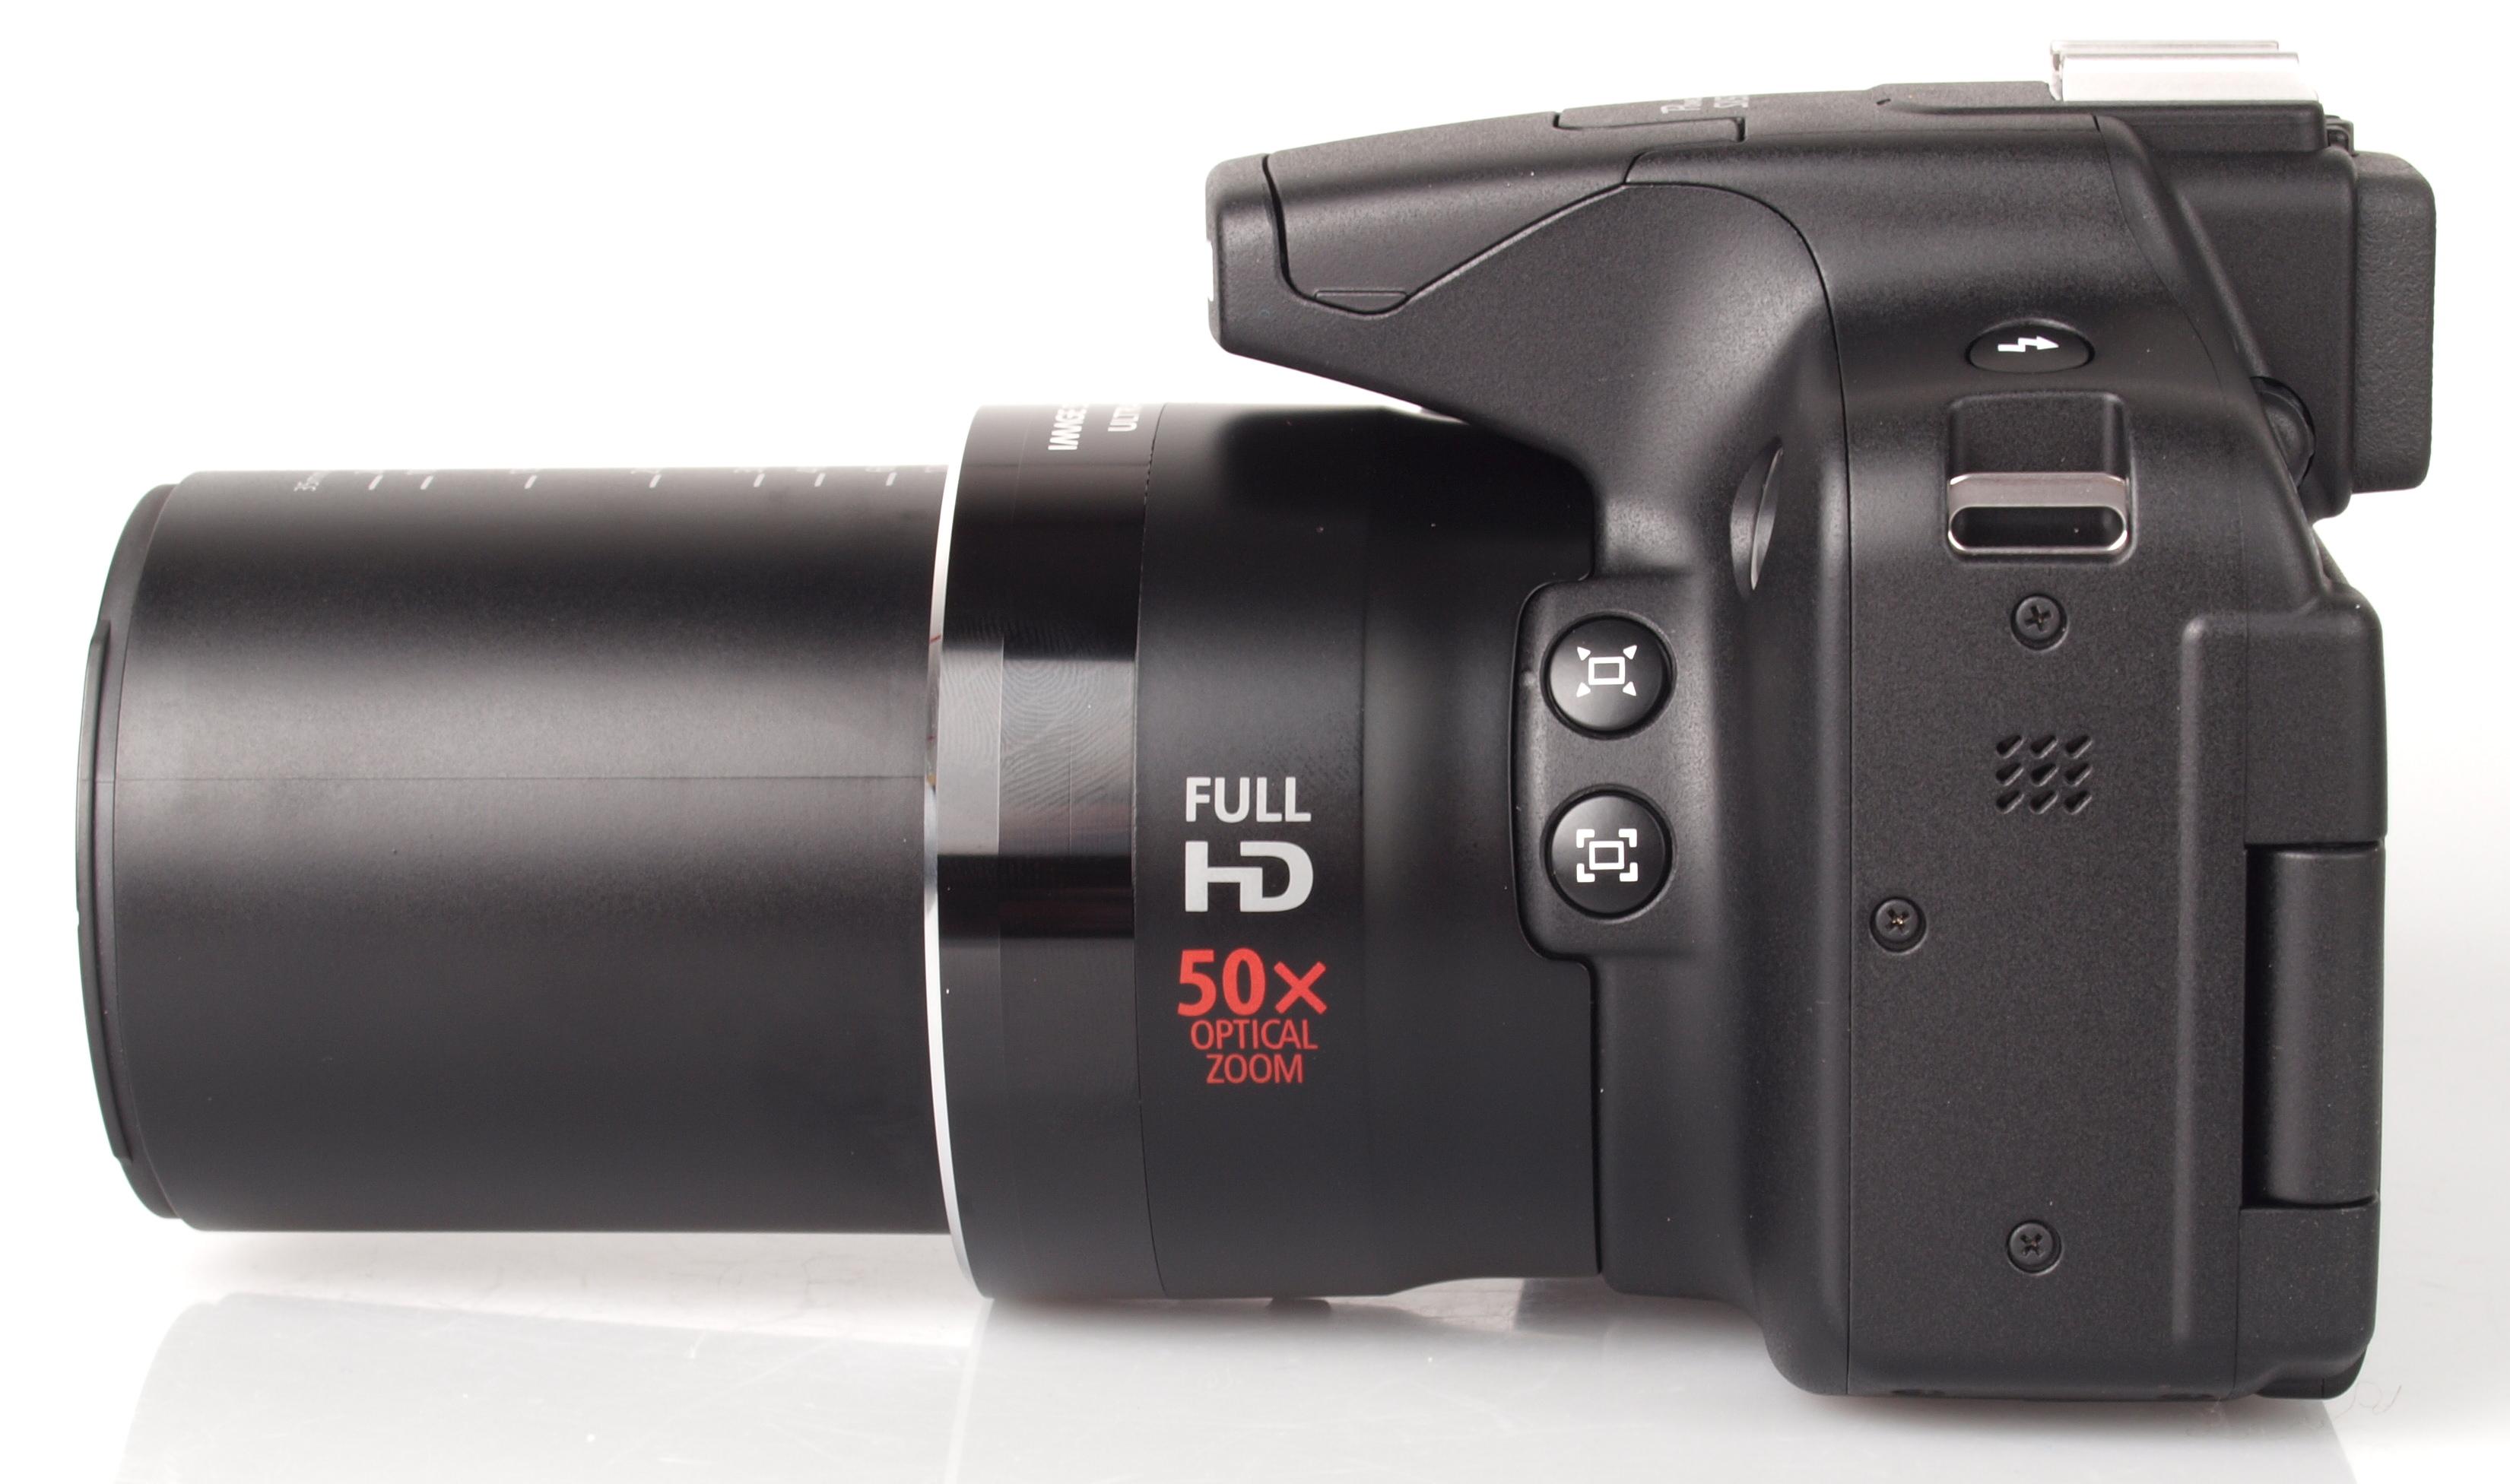 Canon Powershot Sx50 Hs 50x Optical Zoom Digital Camera Review